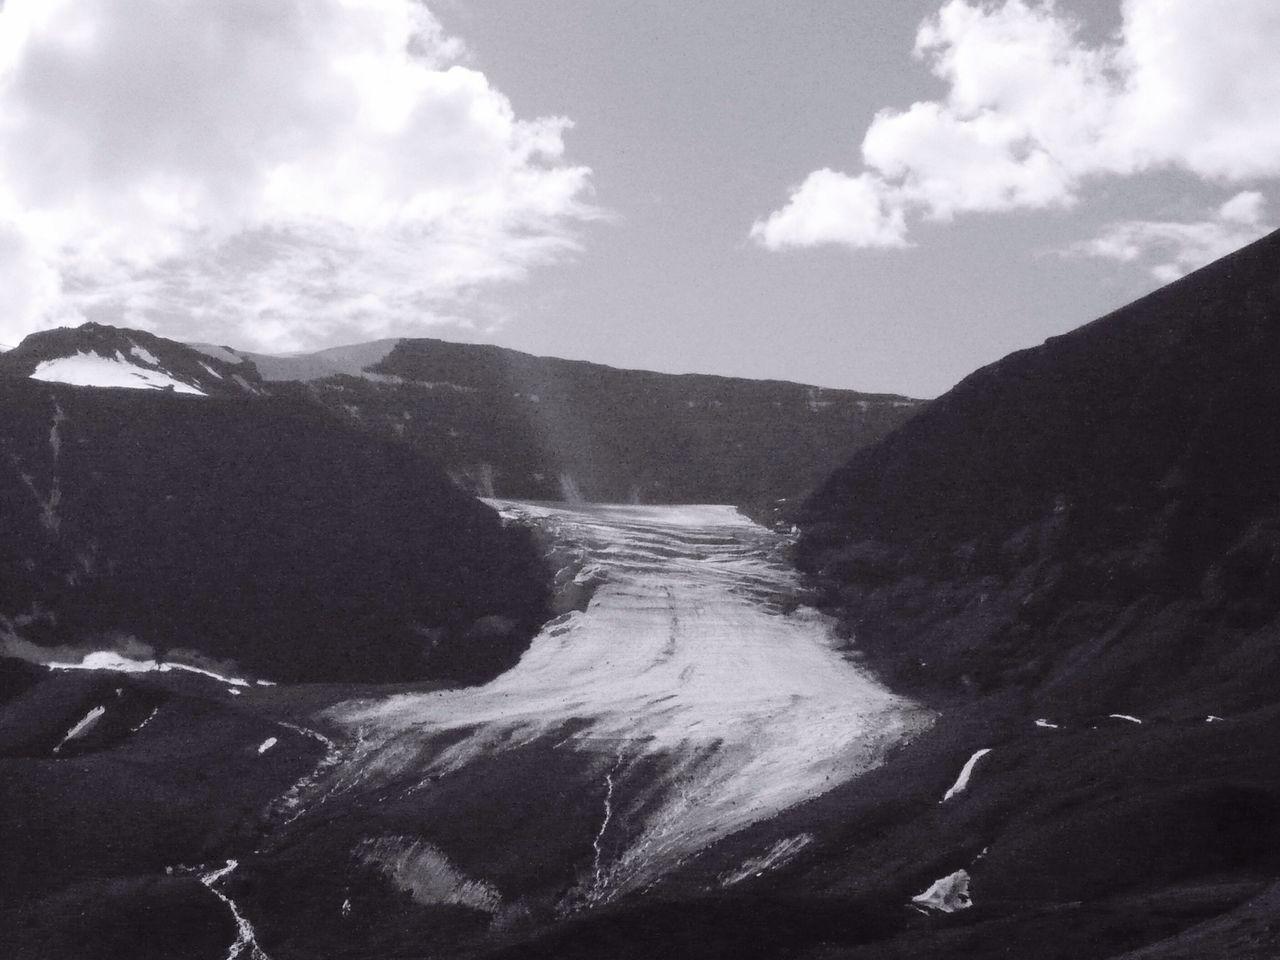 View Of Snow On Mountain At Disco Island